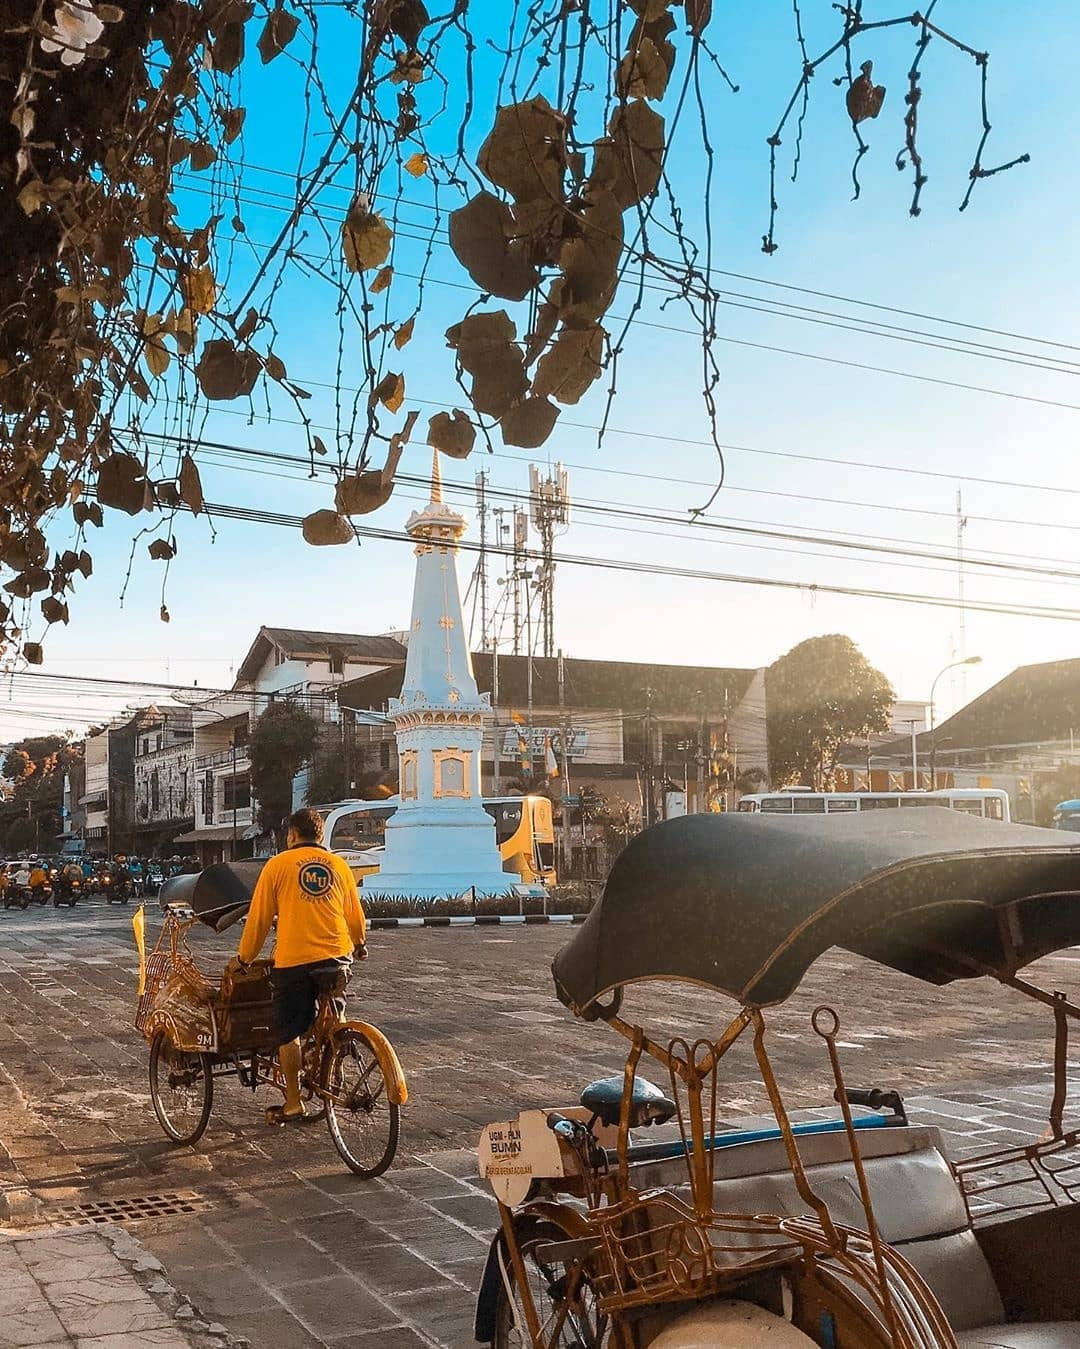 Top 150 Tempat Wisata Jogja Terhits Terfavorit 2020